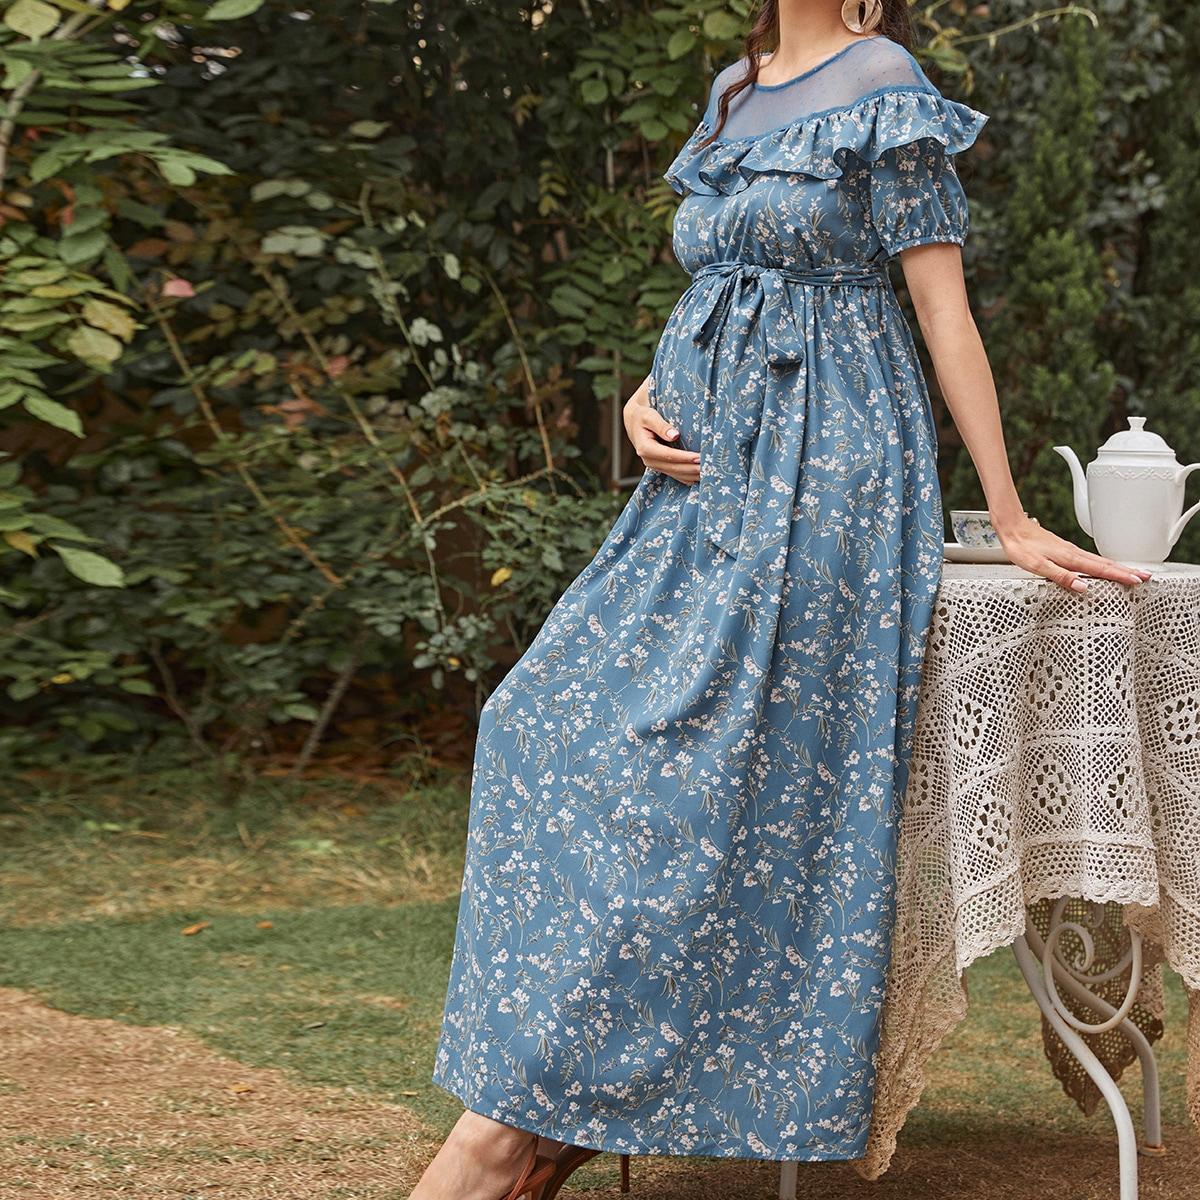 Maternity Mesh Yoke Ruffle Trim Belted Ditsy Floral Dress